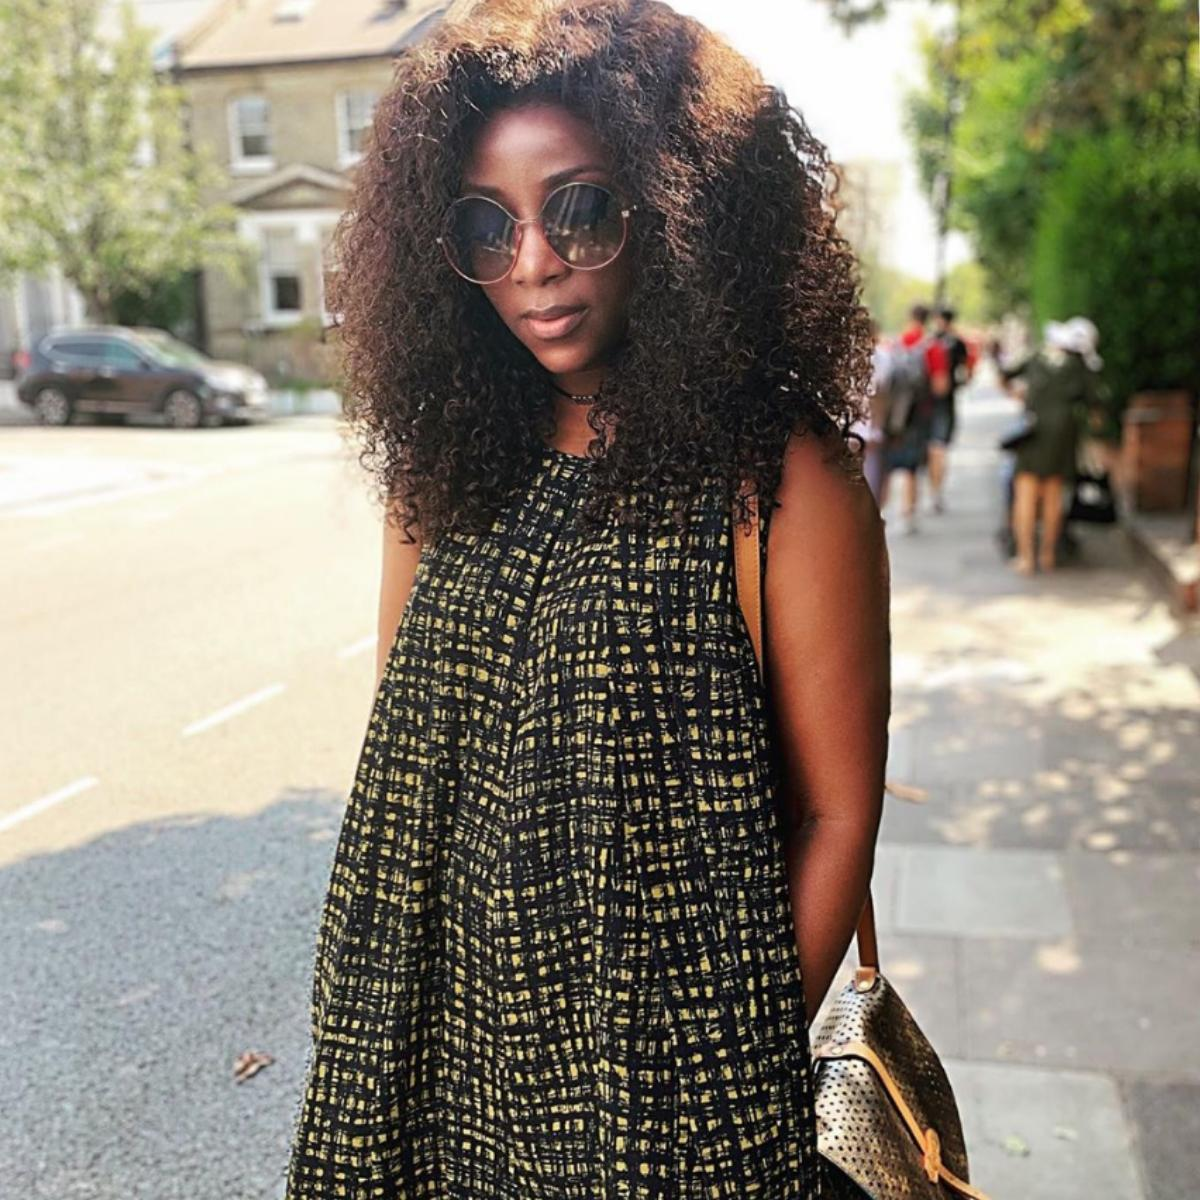 Genevieve Nnaji Reacts To Lion Heart Nomination For An Oscar Award